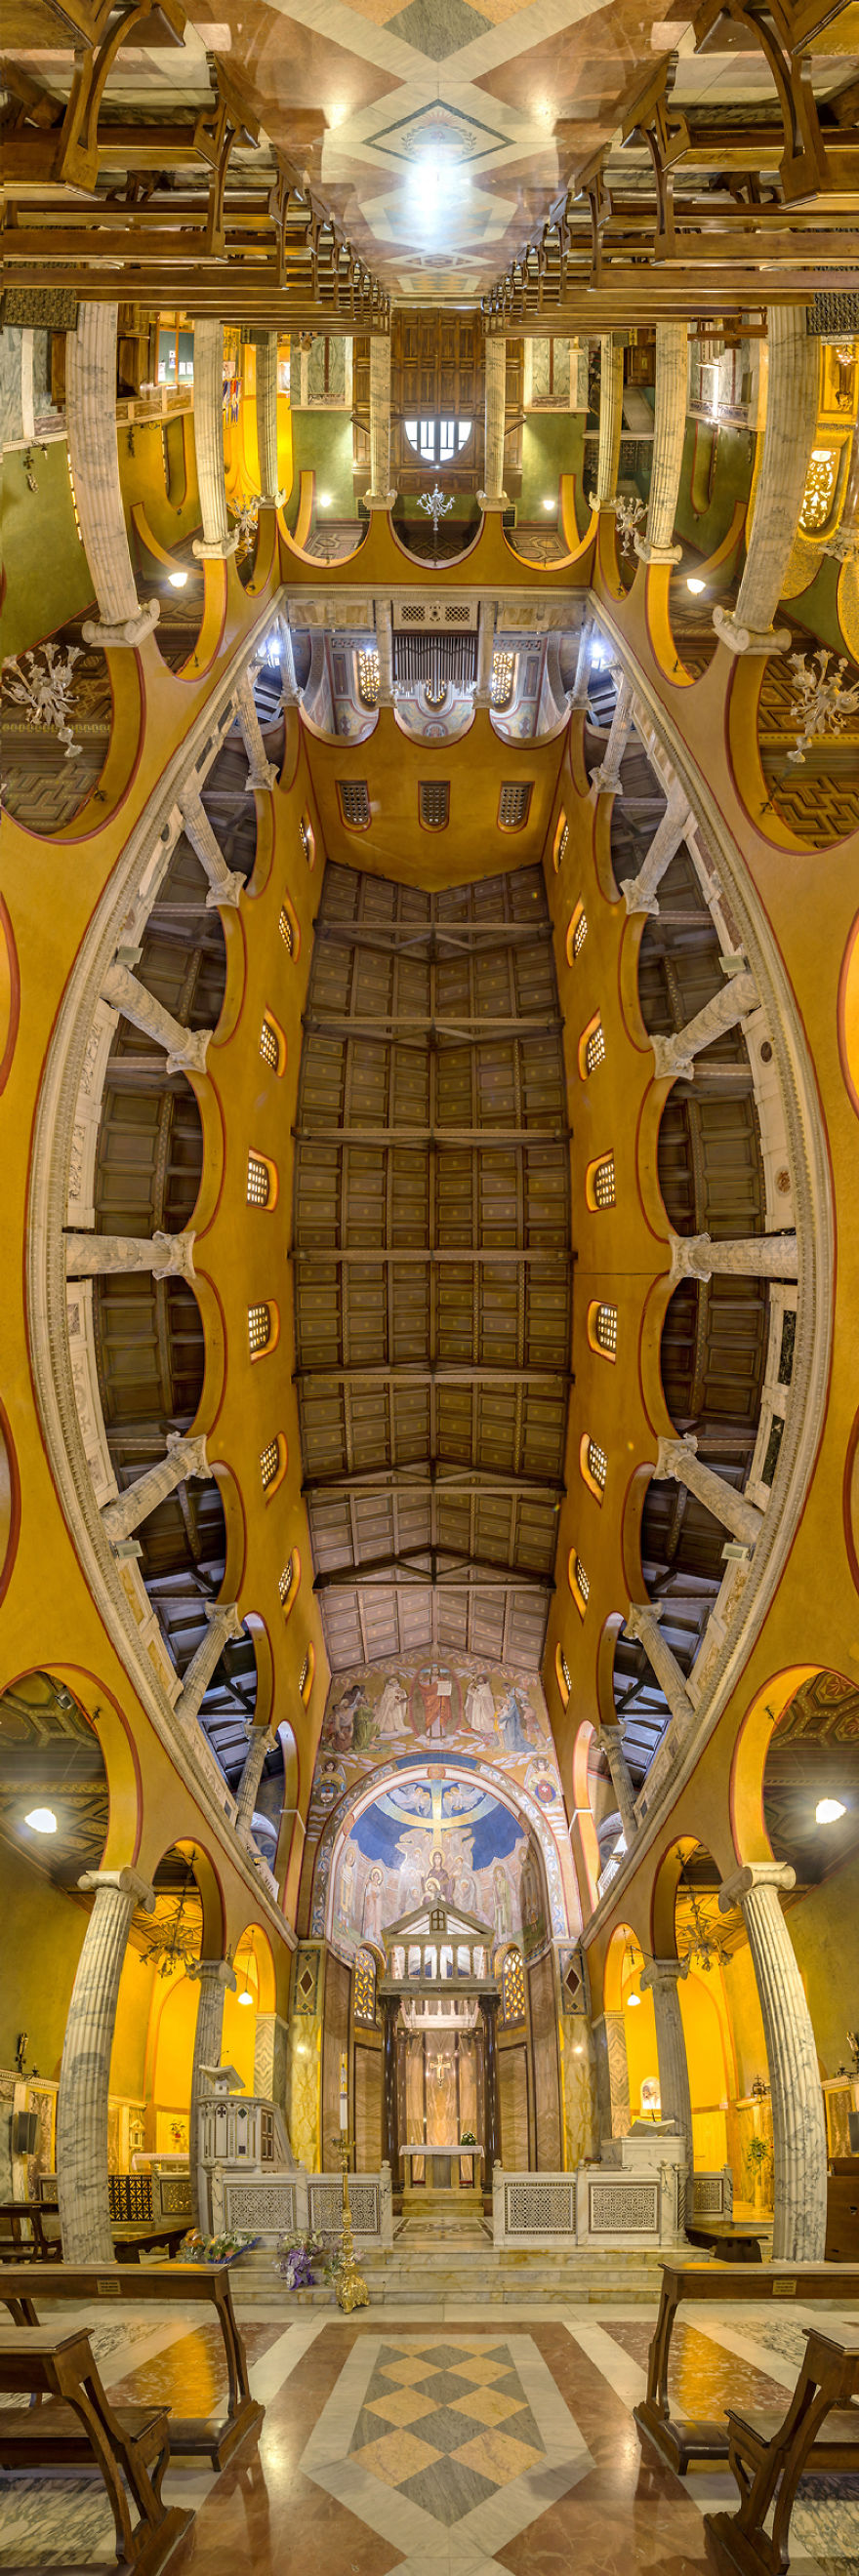 catedrales fotografiadas vertical 5